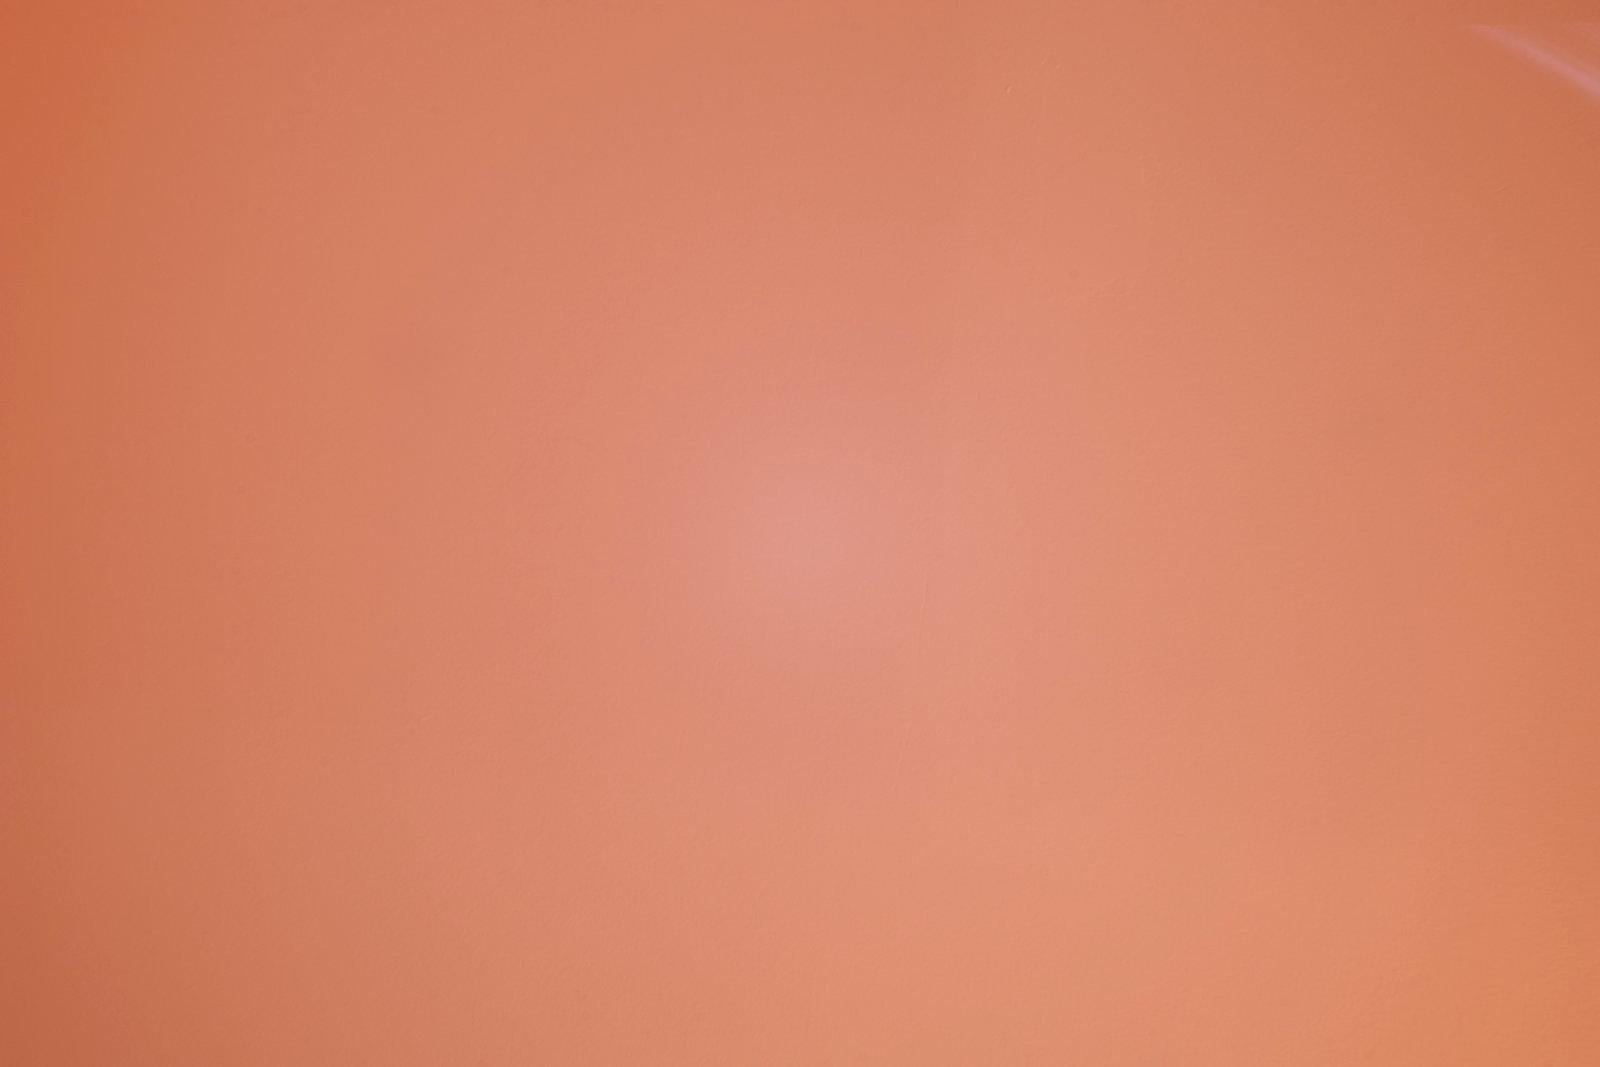 test infrarouge HOTSPOT 24mm F16 SIGMA | Pierre-Louis Ferrer | Test du SIGMA 24mm F/1.4 DG HSM Art en photographie infrarouge | Partie 1